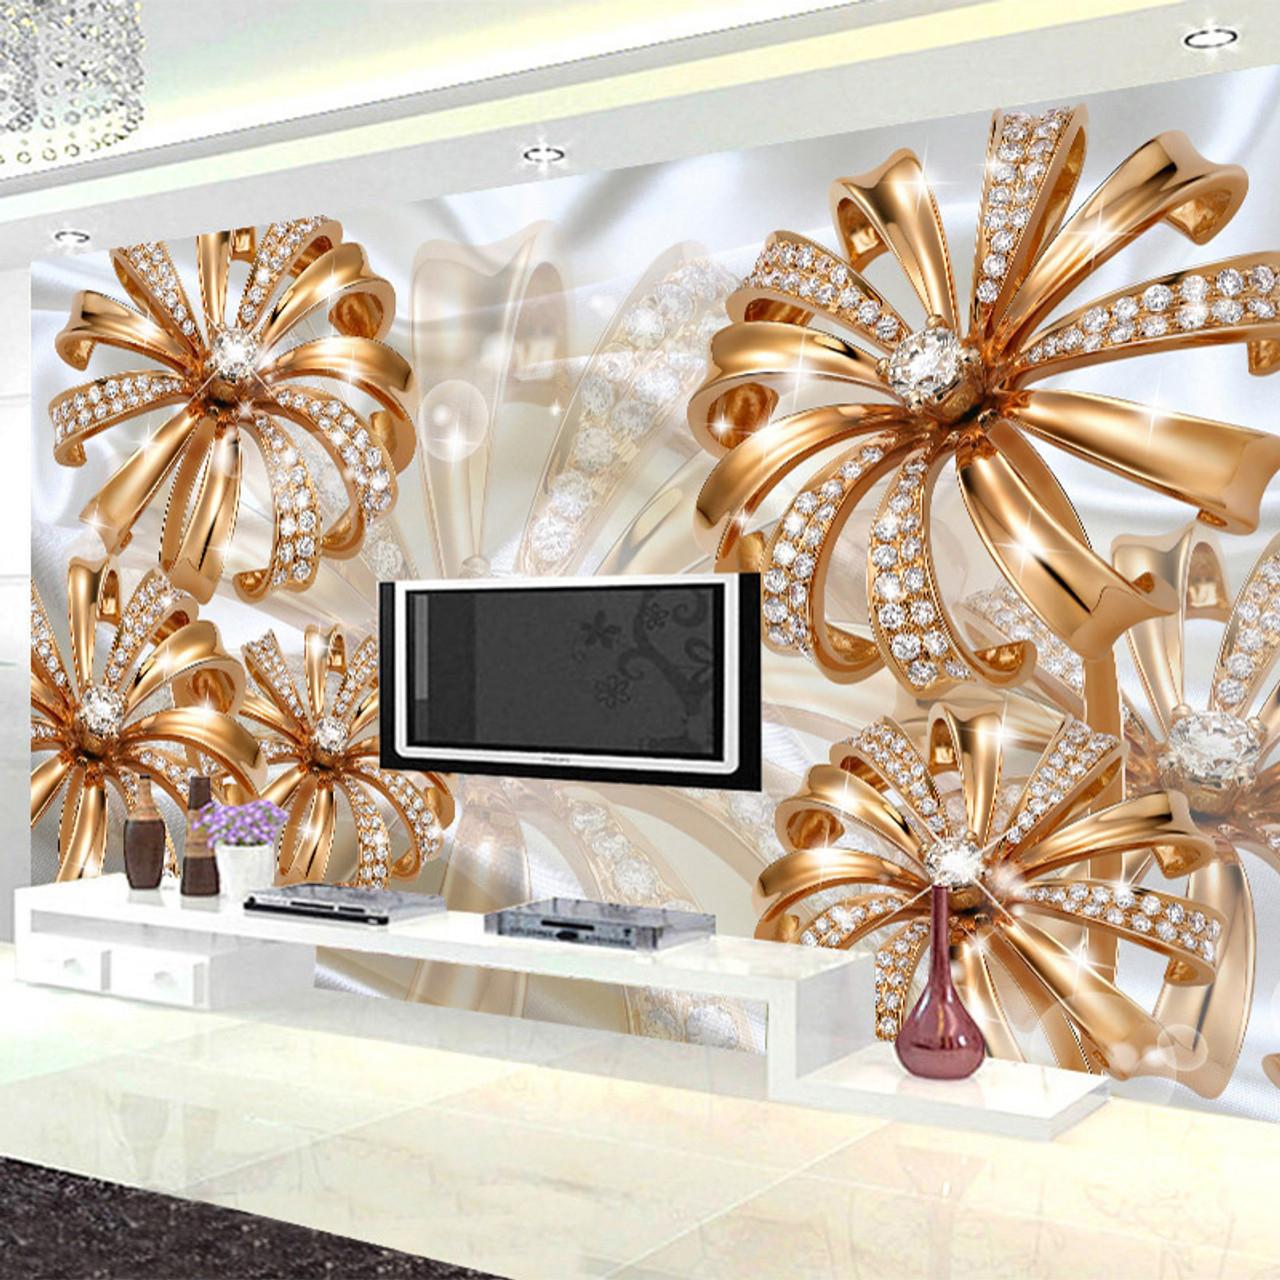 Custom Photo Wallpaper 3d Stereo Gold Diamond Flower Jewelry Mural